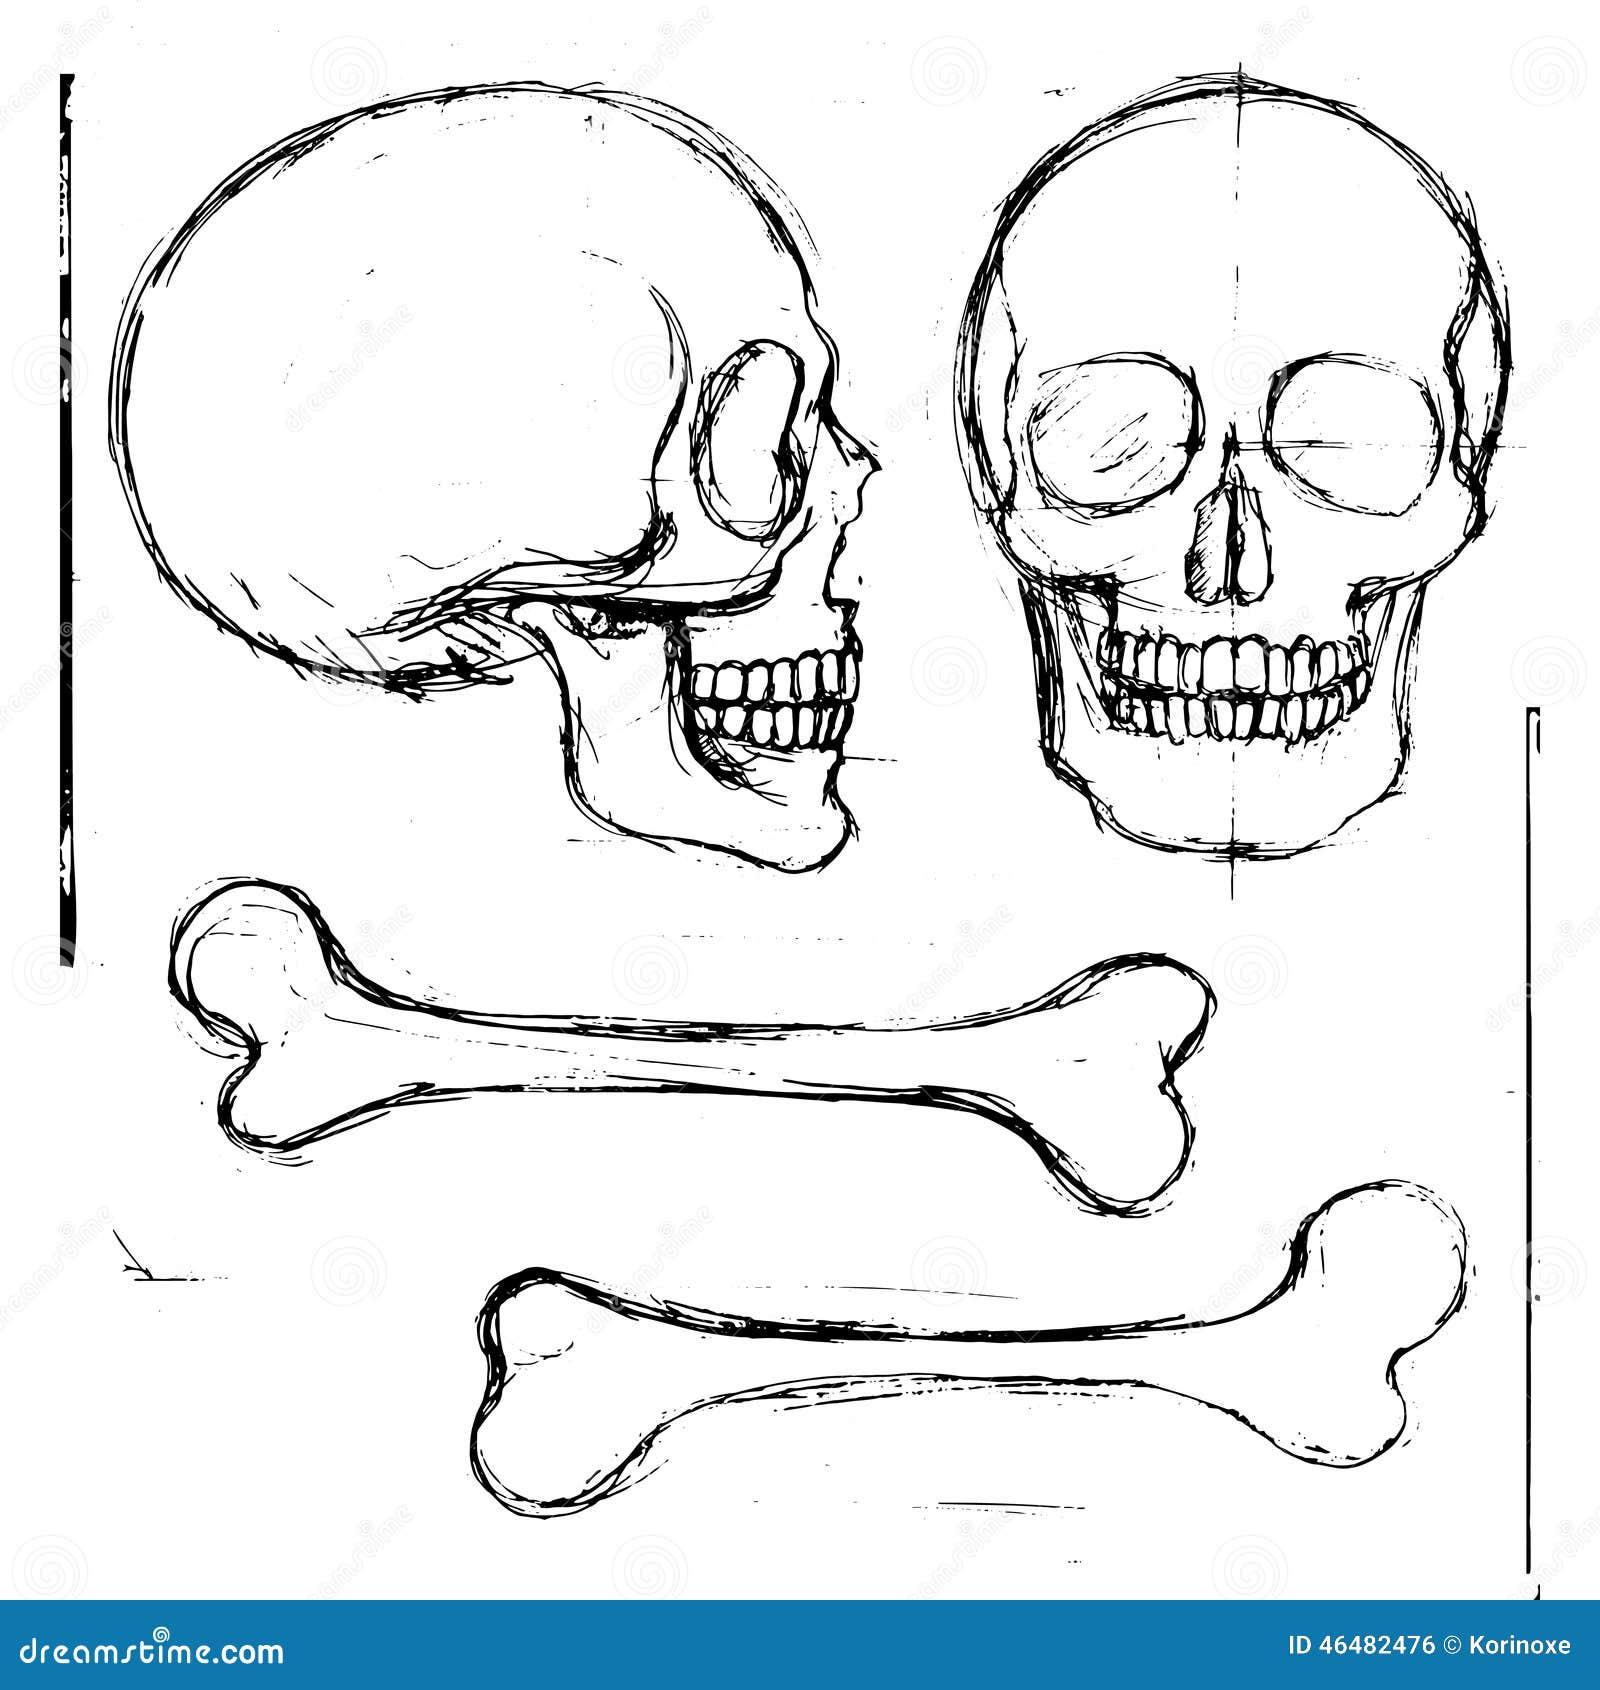 Hand Drawn Human Skull And Bones Stock Vector - Illustration of ...